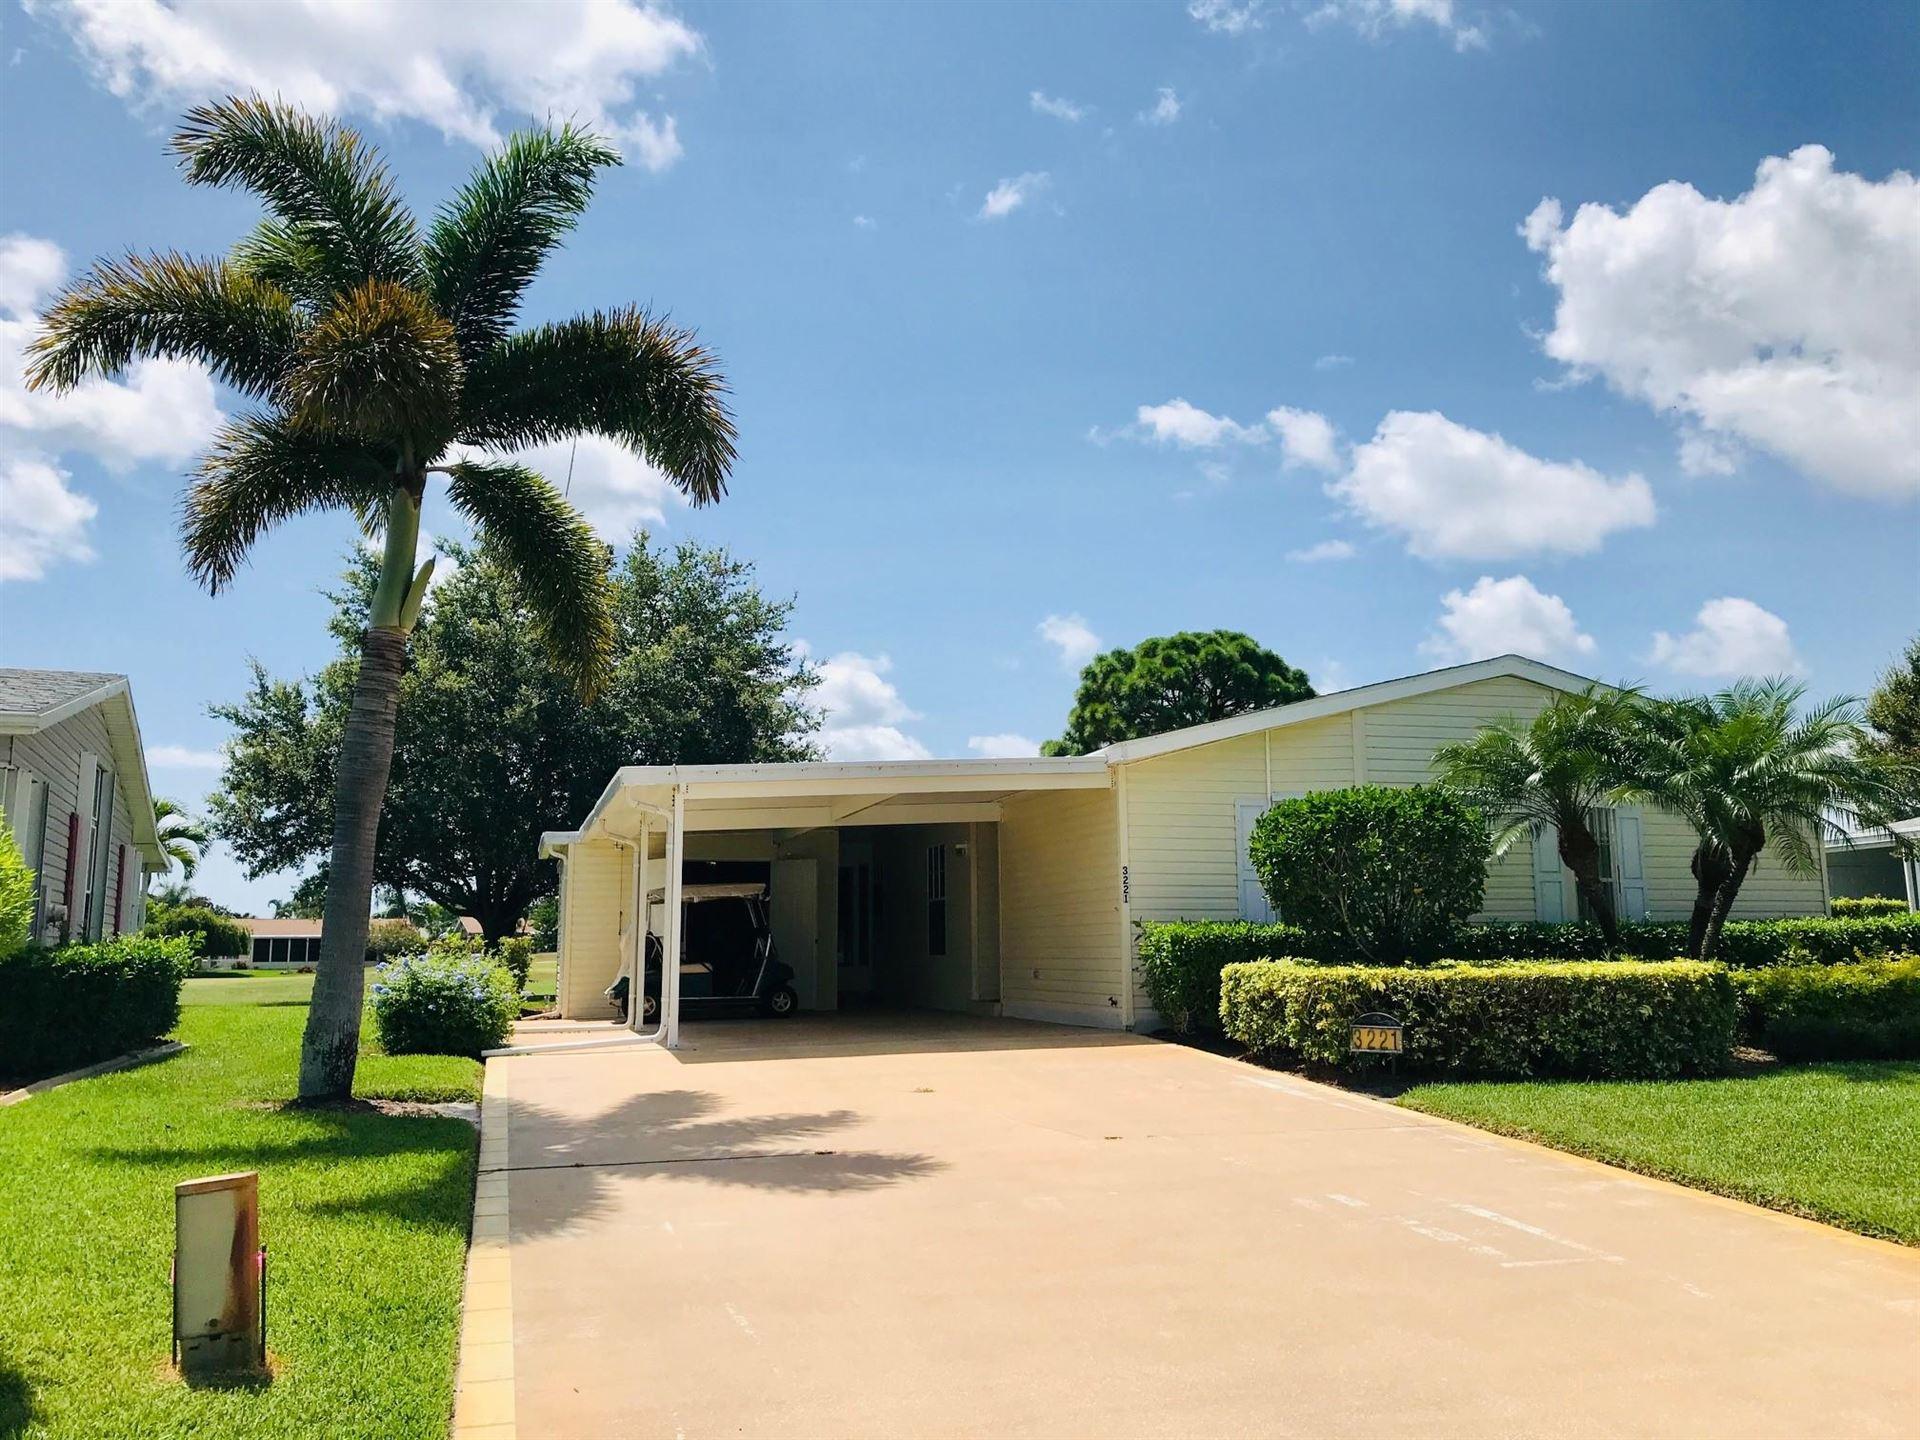 3221 Scarlet Tanger Court, Port Saint Lucie, FL 34952 - #: RX-10637408